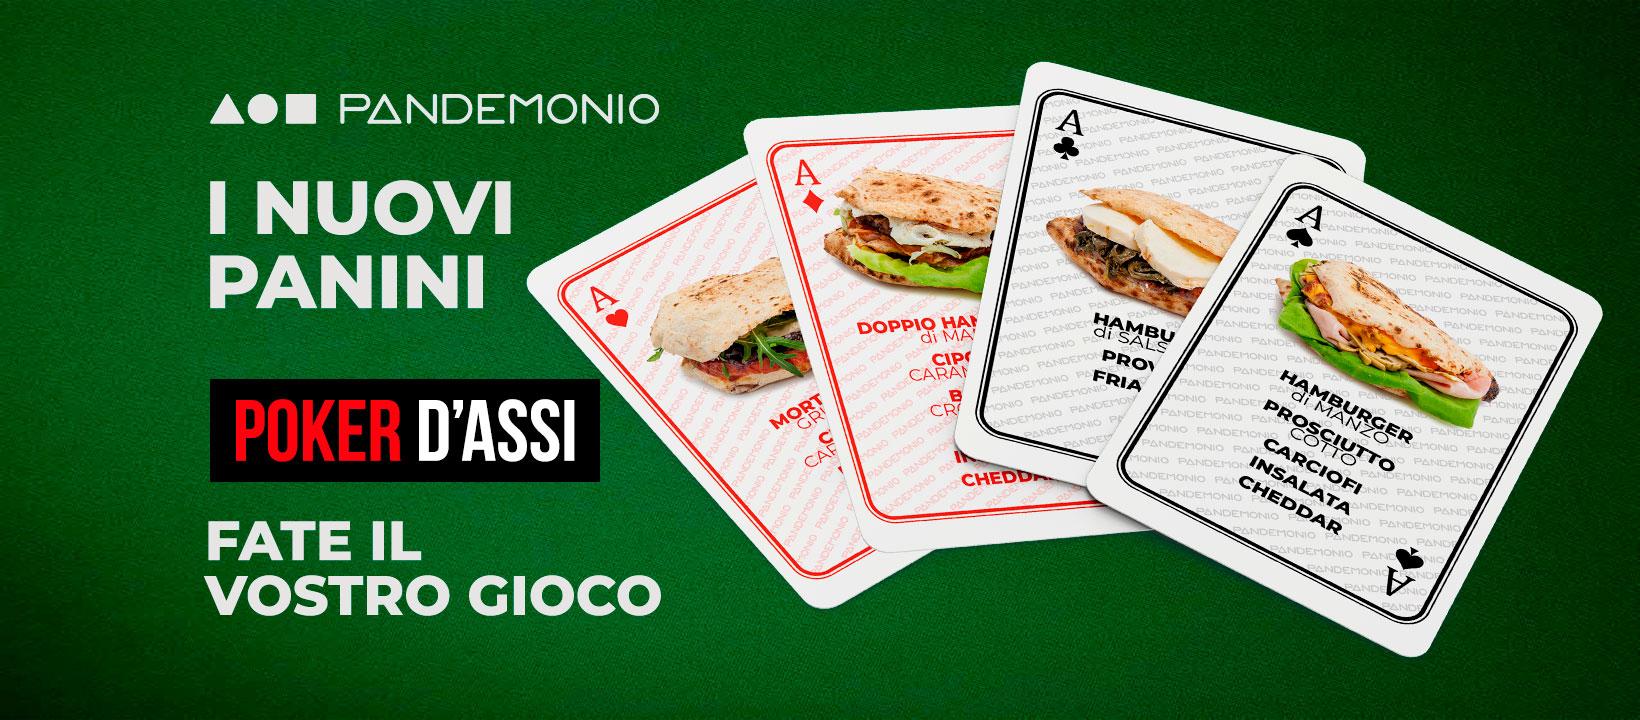 Copertina Facebook POKER d'ASSI - Pandemonio Spoleto